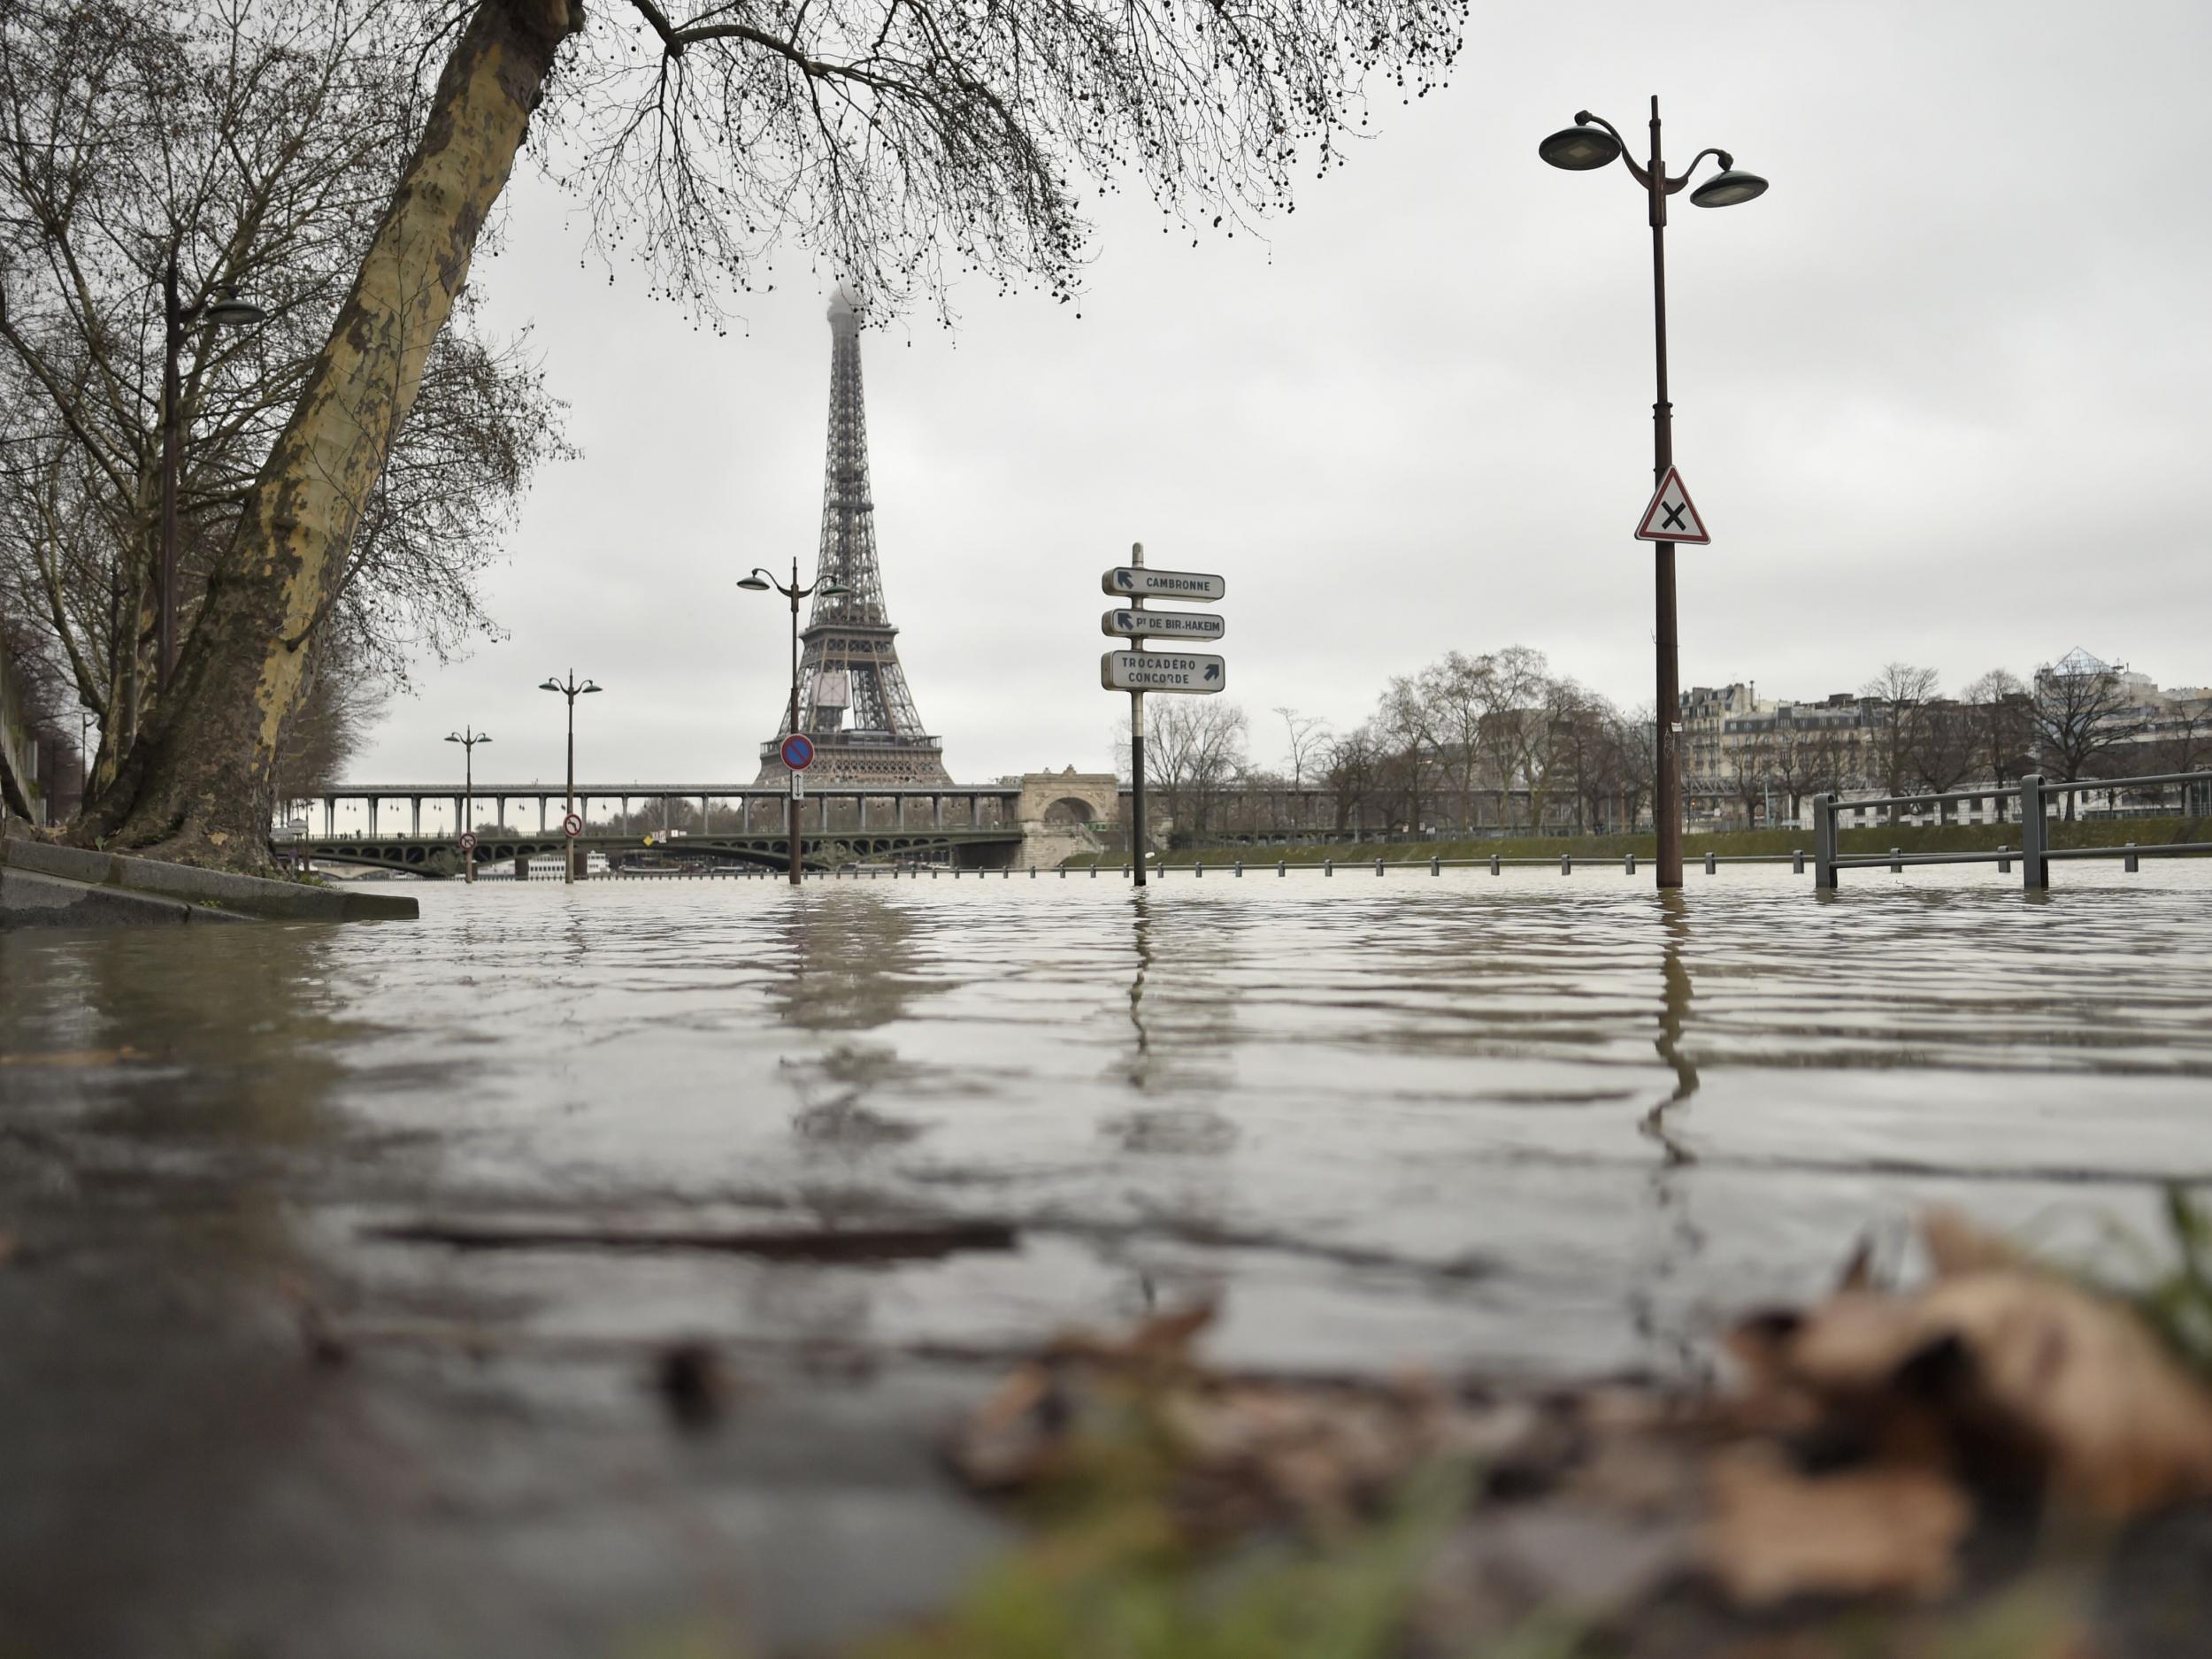 Paris braced for floods after heavy rain causes Seine River to burst banks